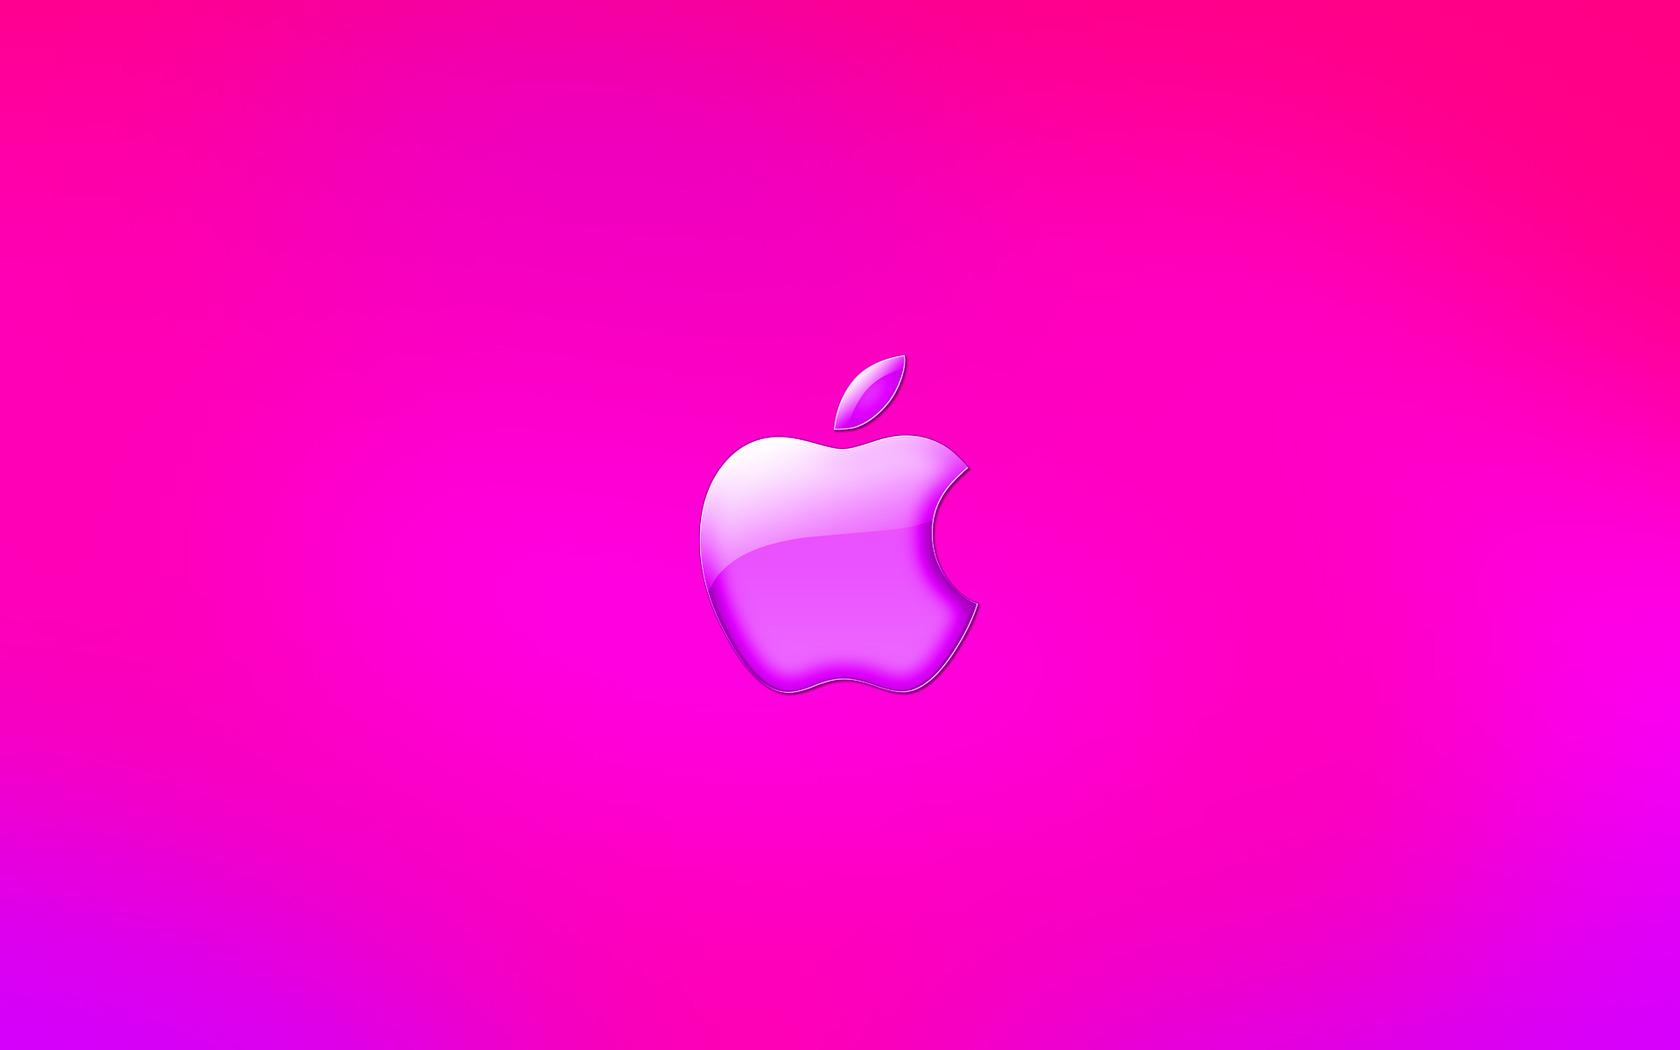 Pink Apple Logo Wallpaper